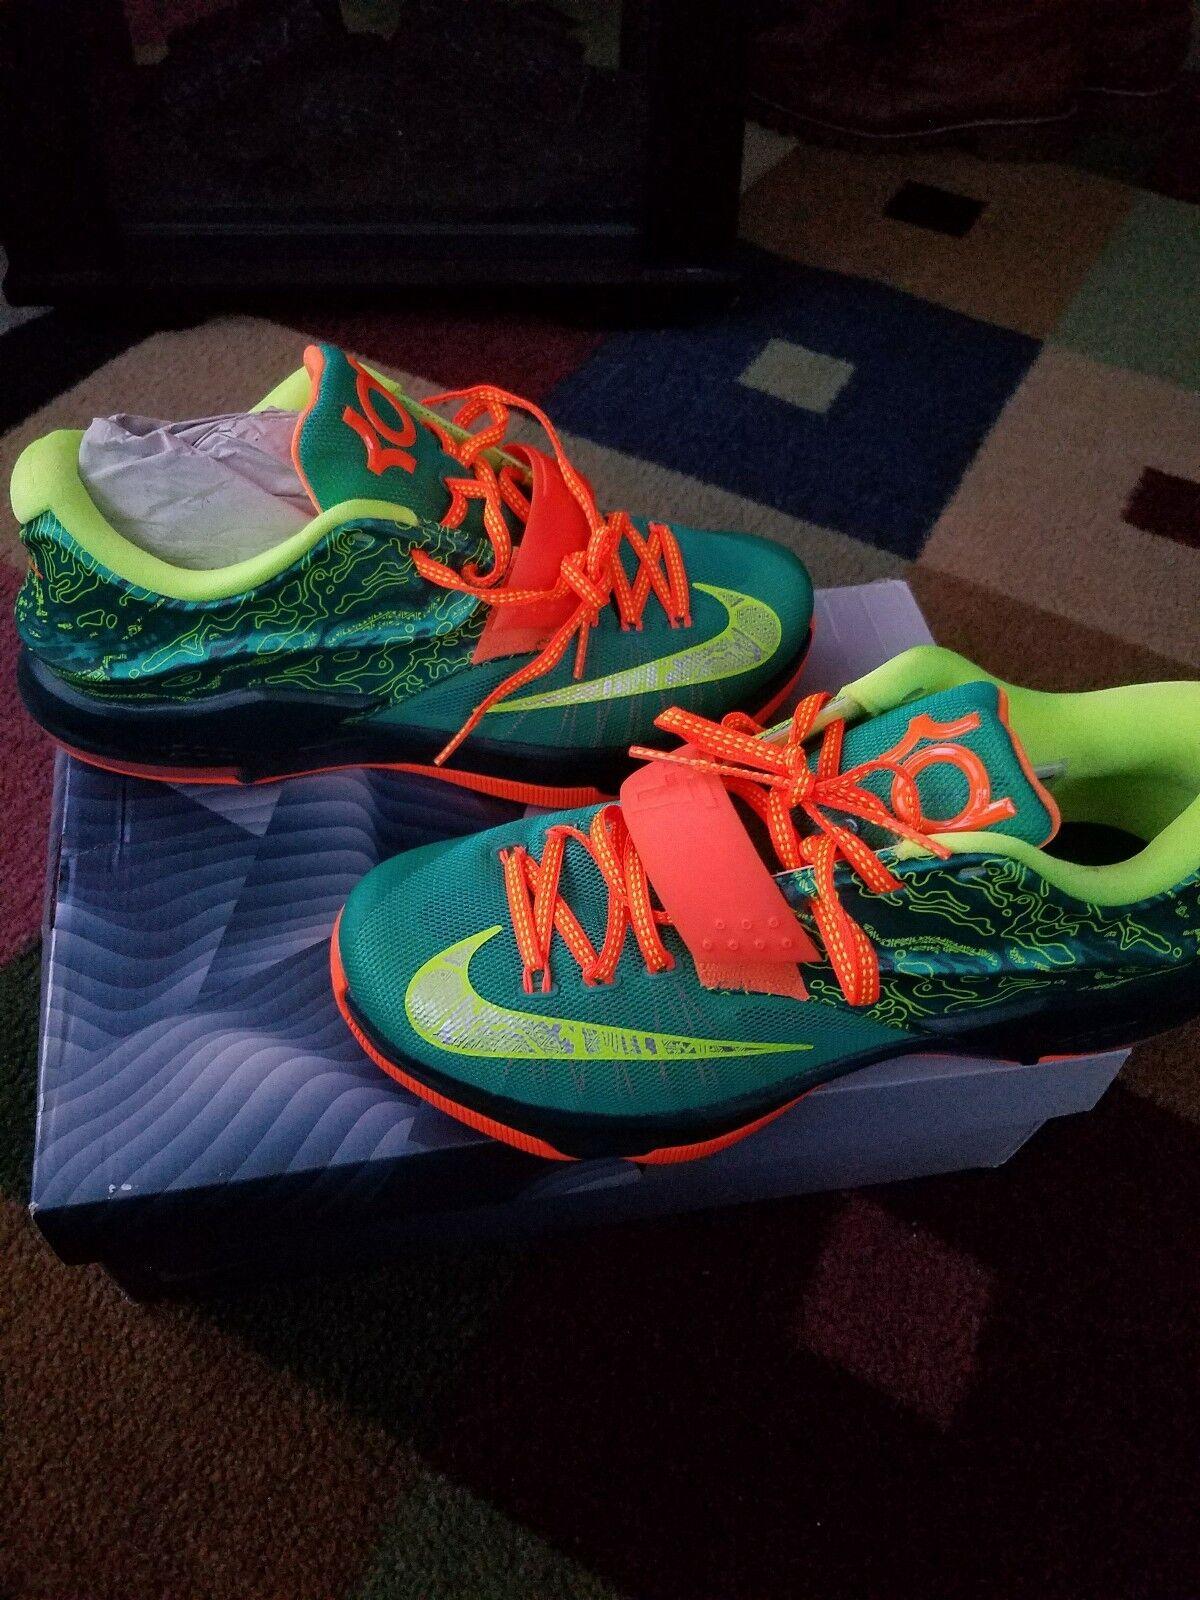 Nike KD Kevin Durant 7 Weatherman 653996 303 Size 10 NDS OG ALL Nice Sneaker